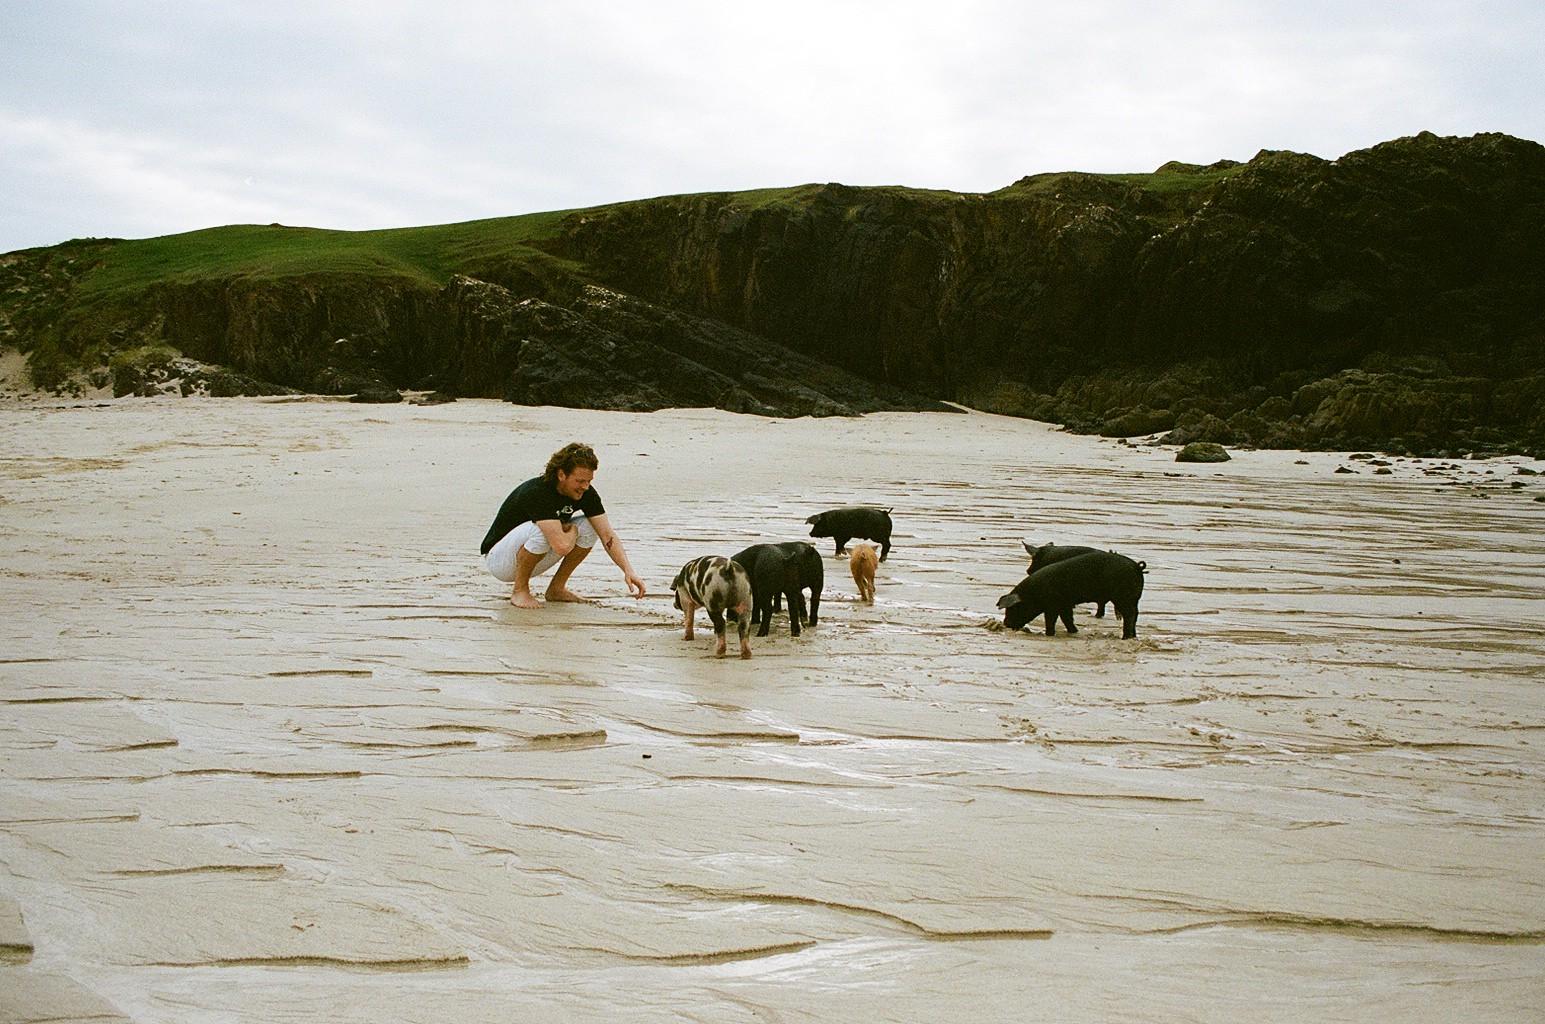 The Little Magpie Scotland Photo Diary North Coast 500 8